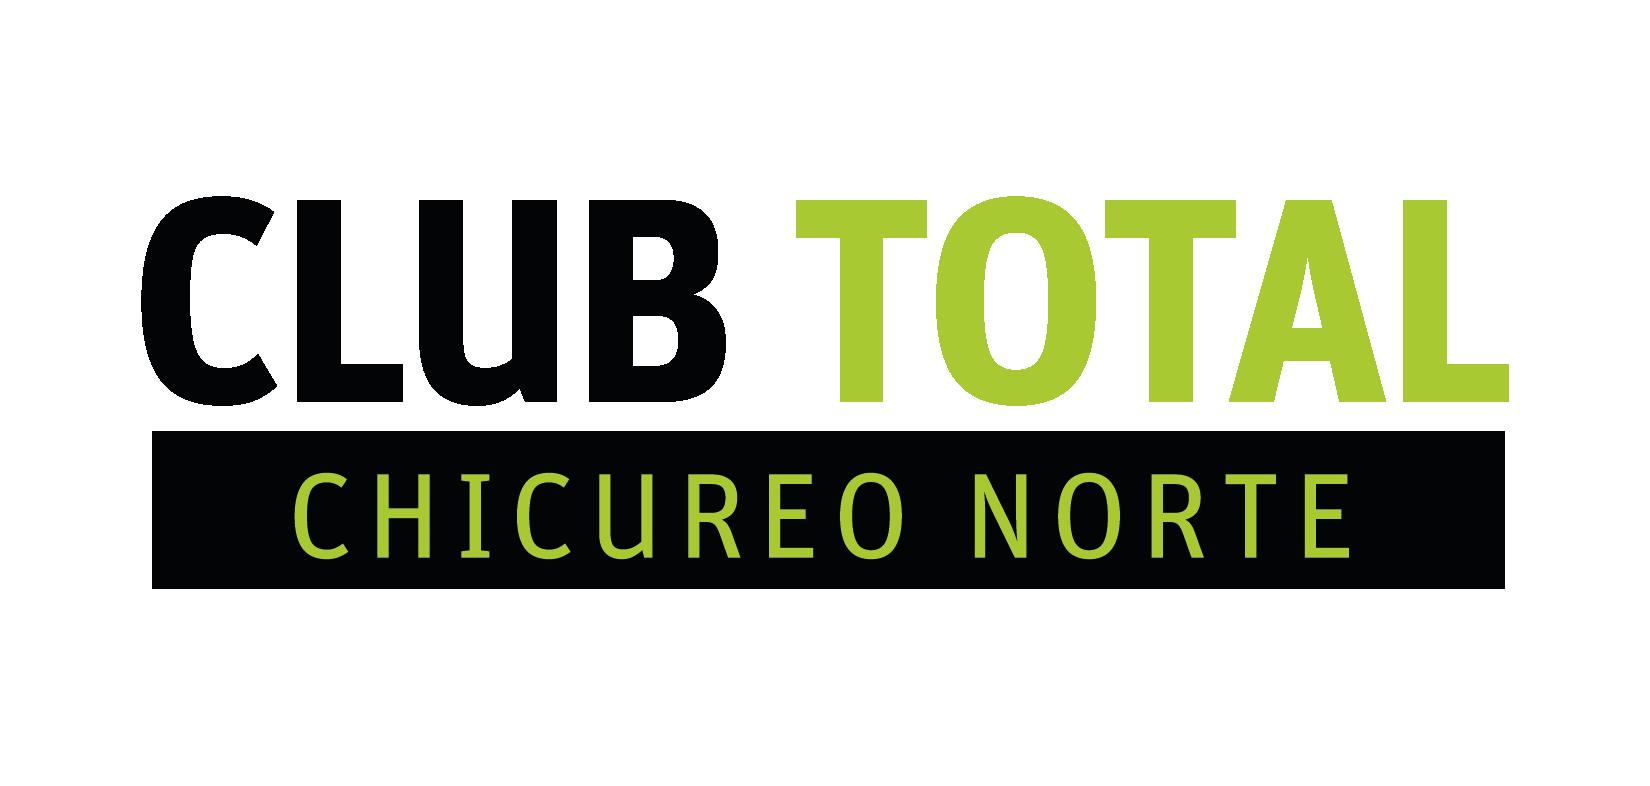 Copa Club Total Chicureo Norte F8